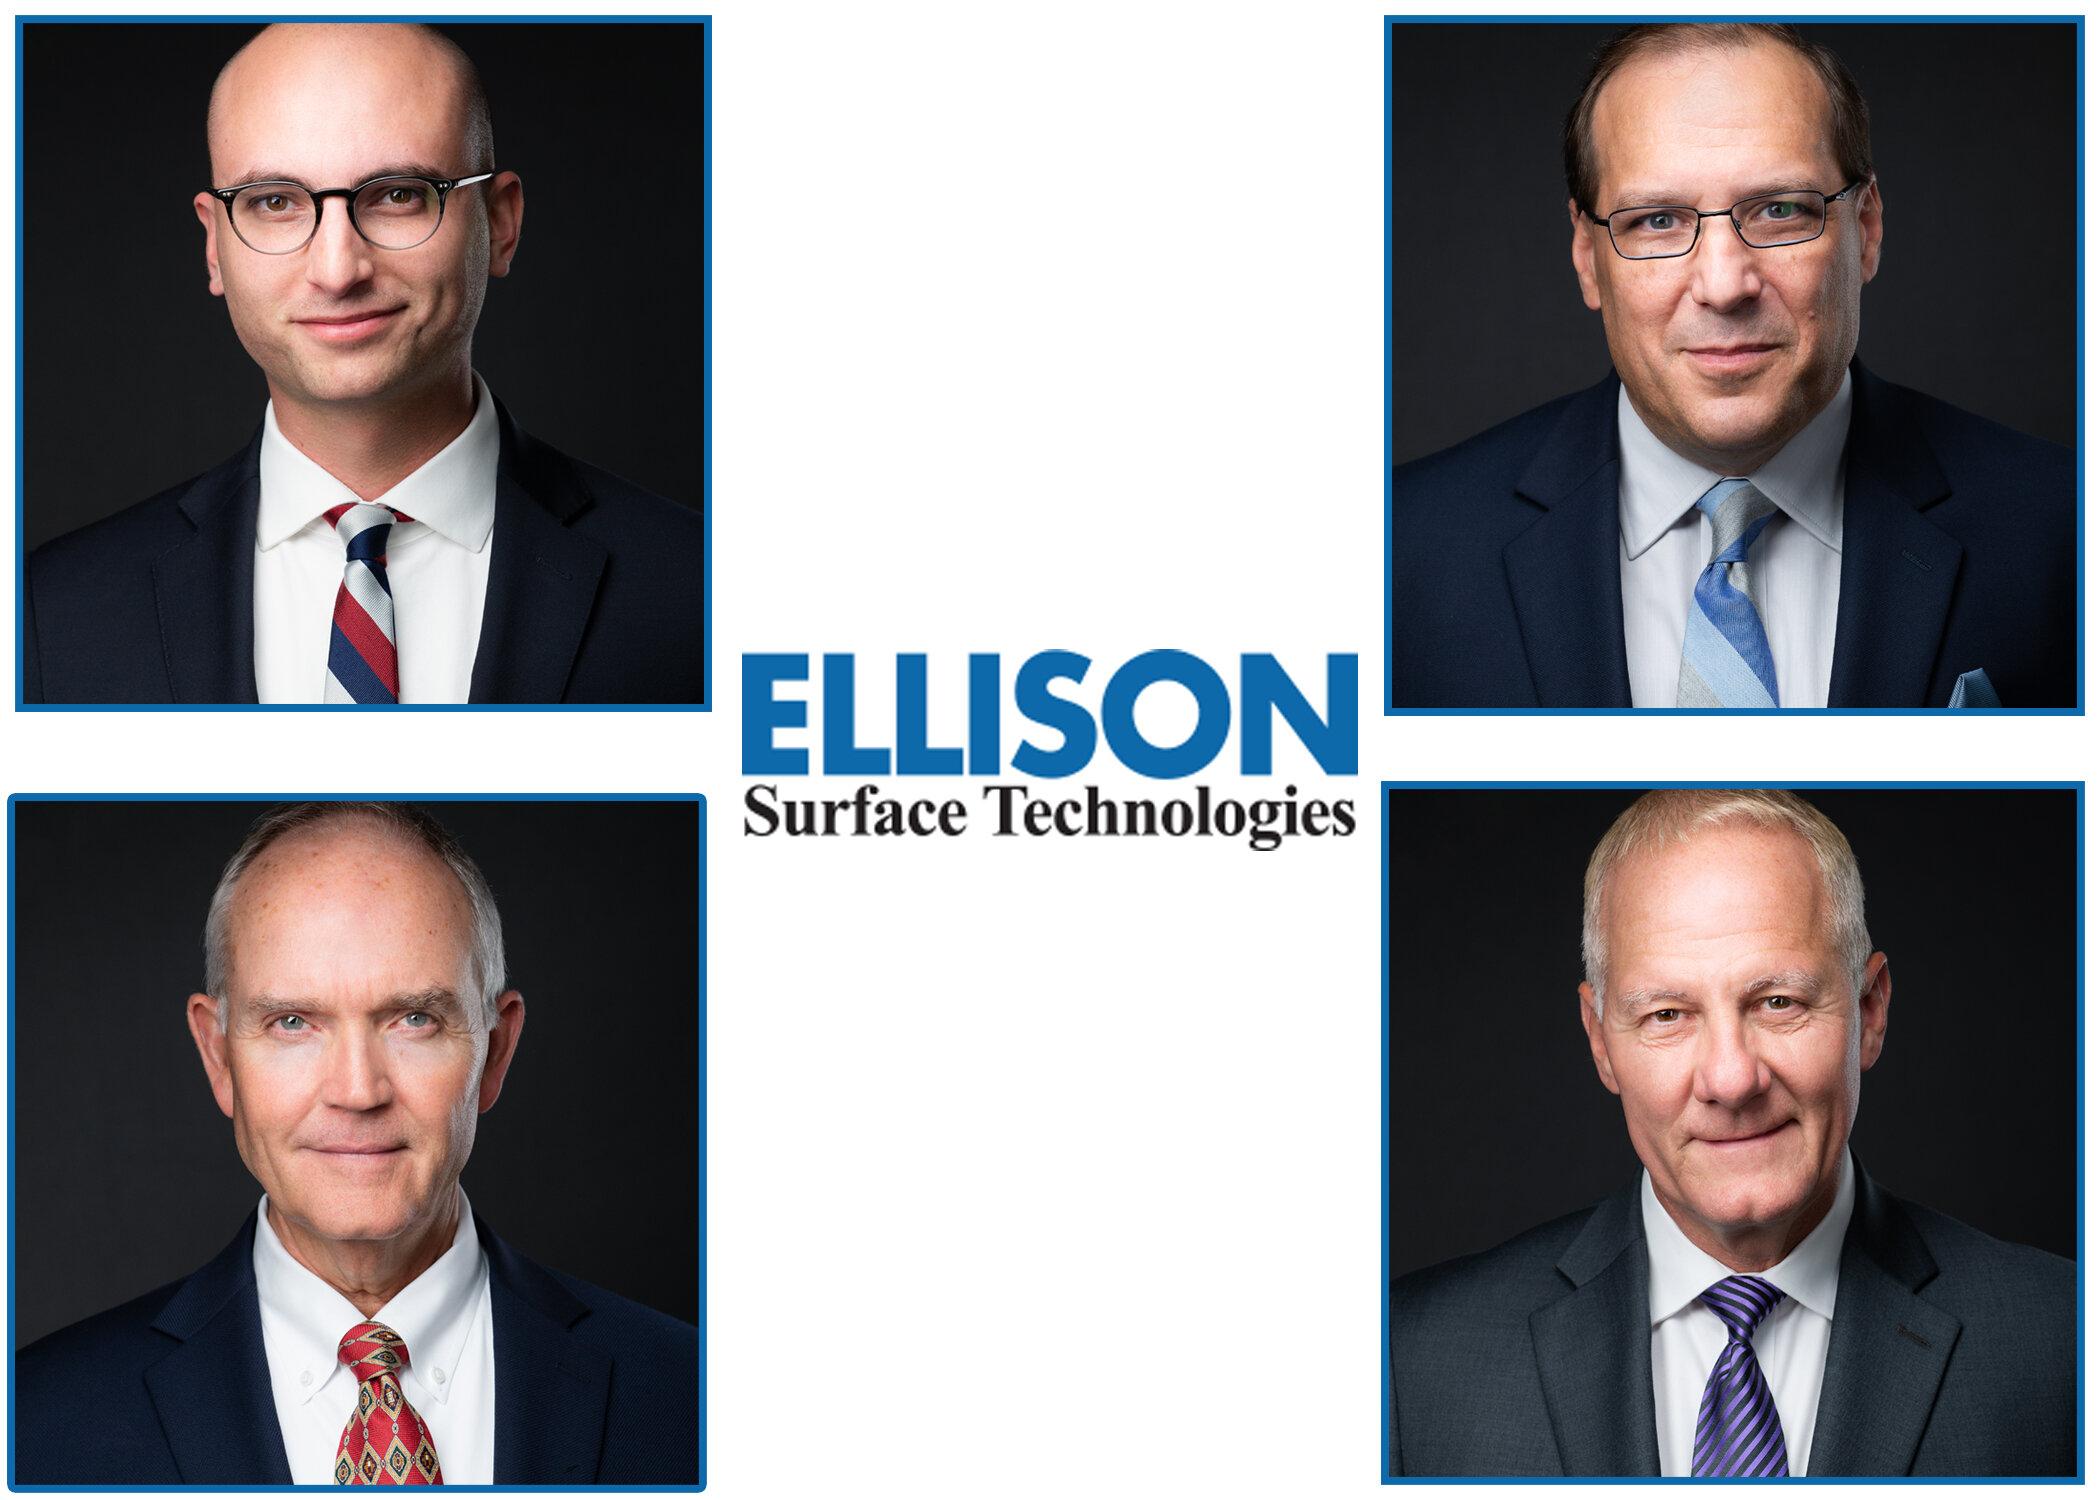 Ellison grid.jpg